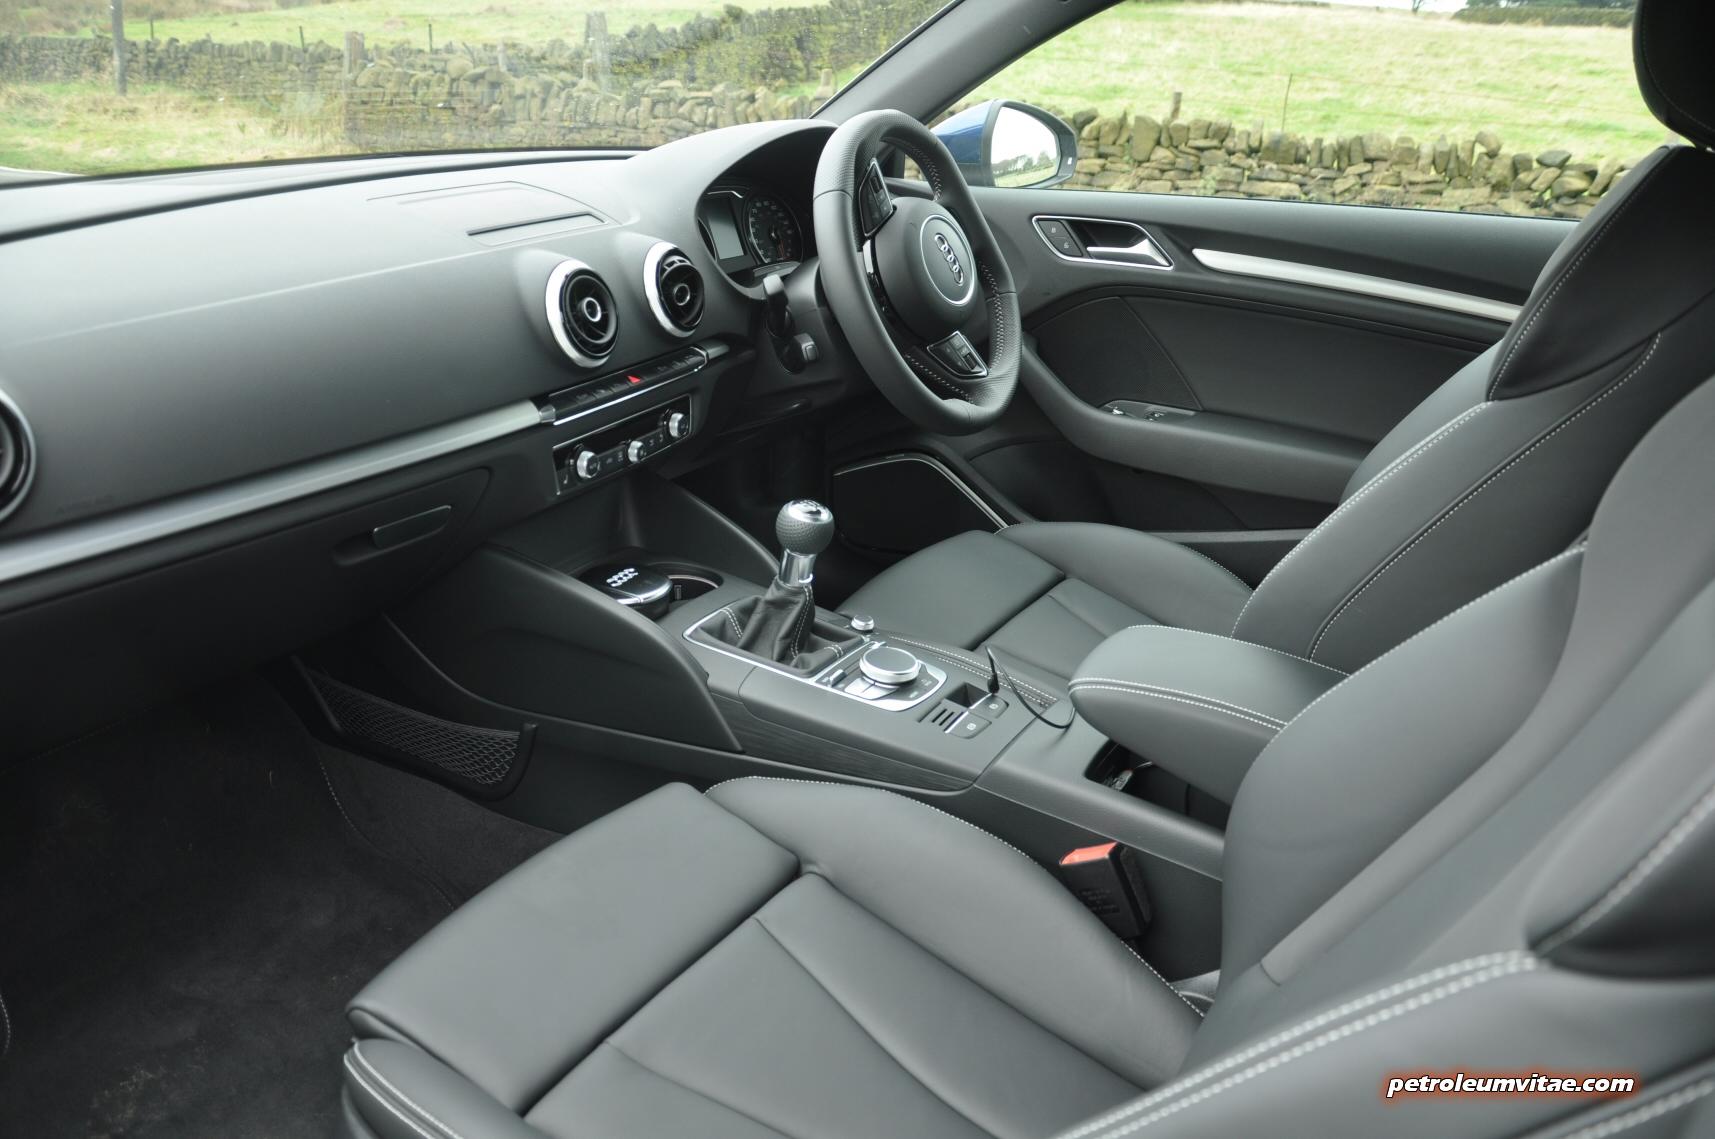 Audi A3 1.4 TFSI CoD S-Line Full Road Test Review « Petroleum Vitae